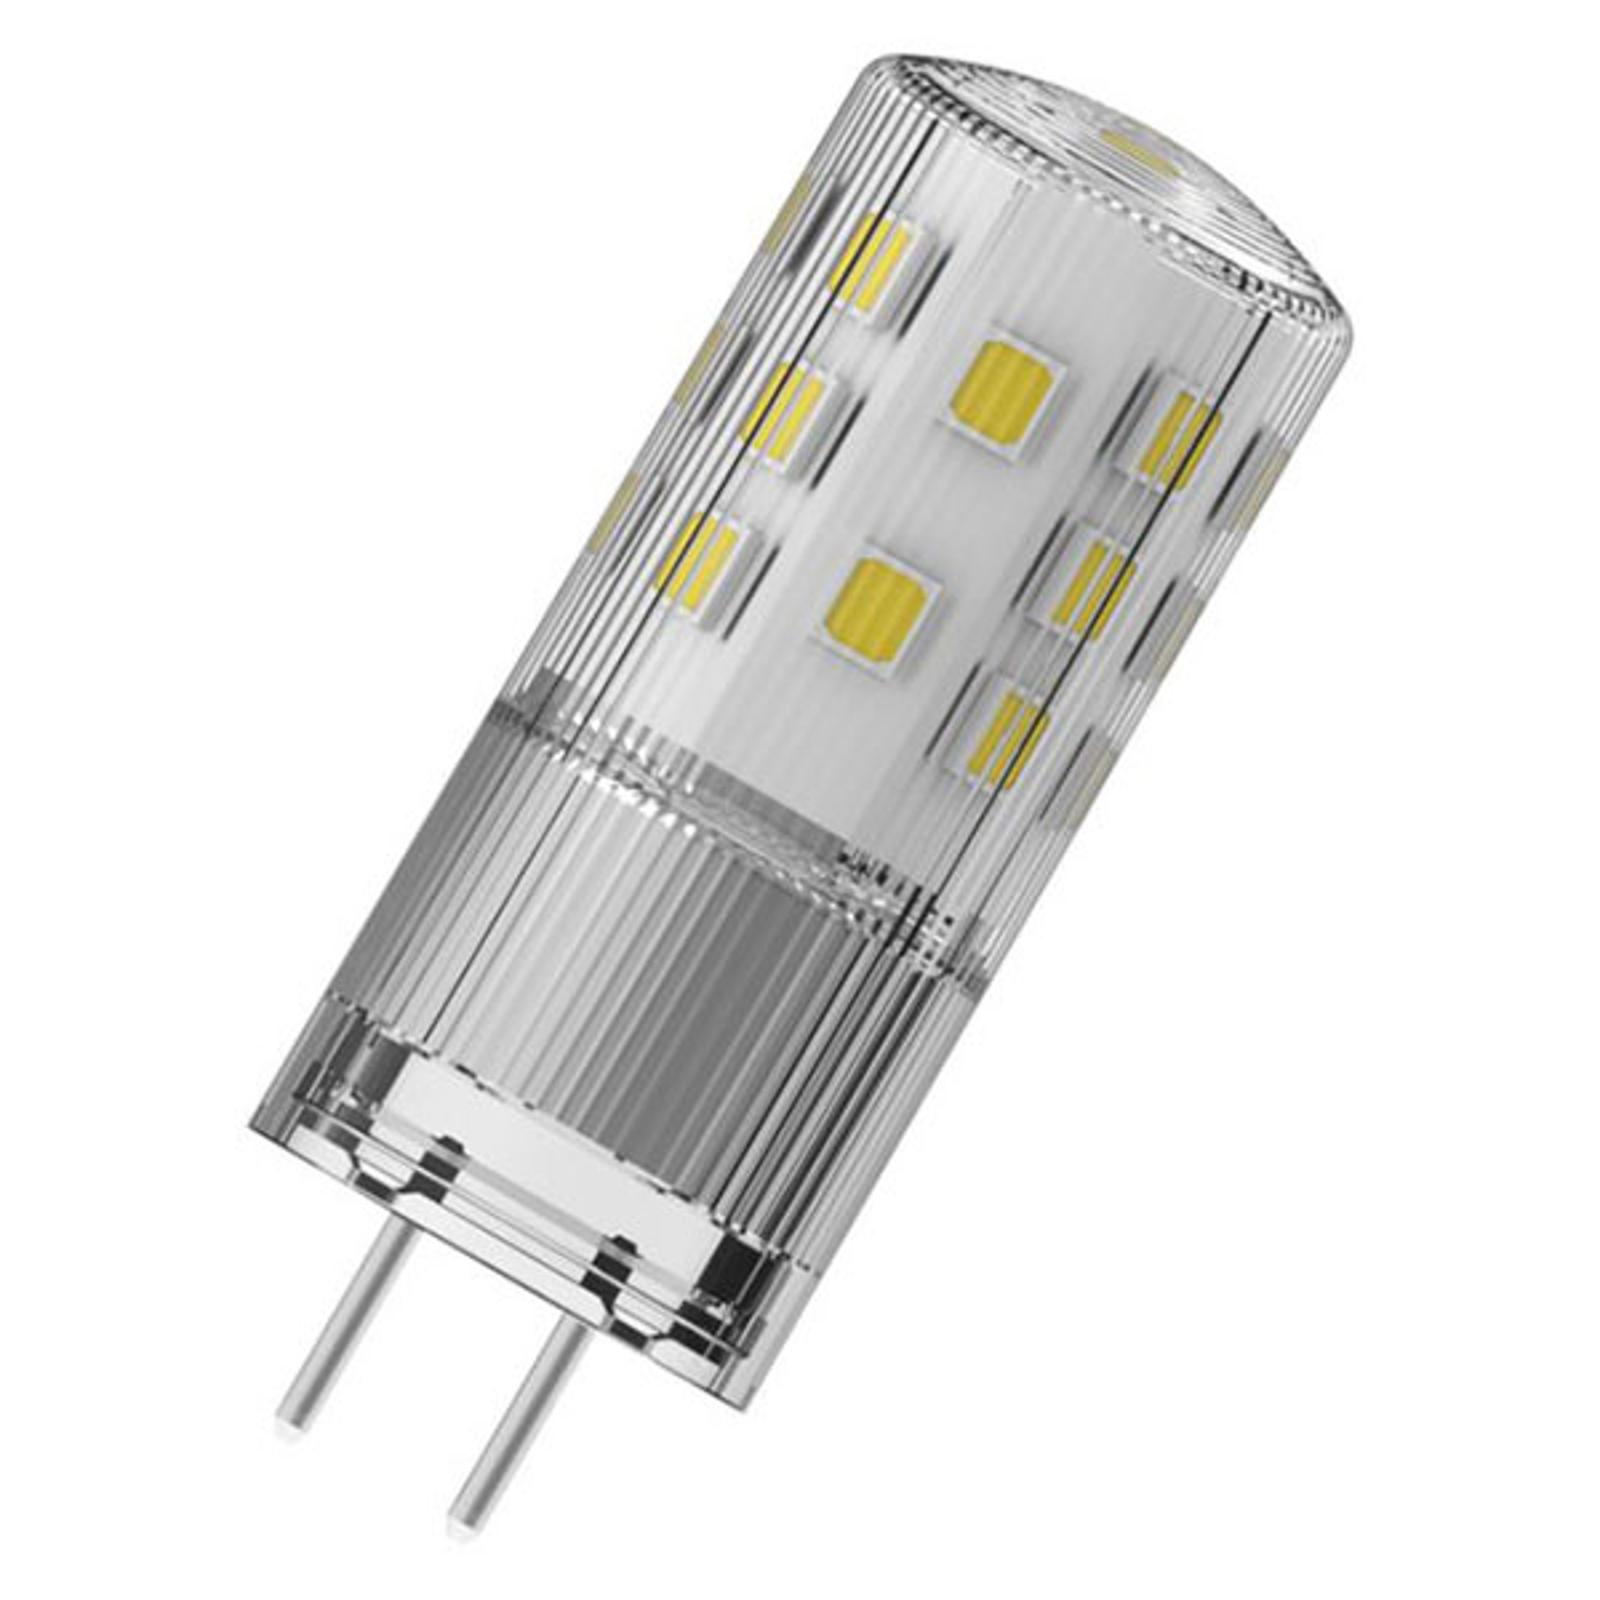 OSRAM LED-stiftpære GY6,35 3,6 W 2700K dimbar